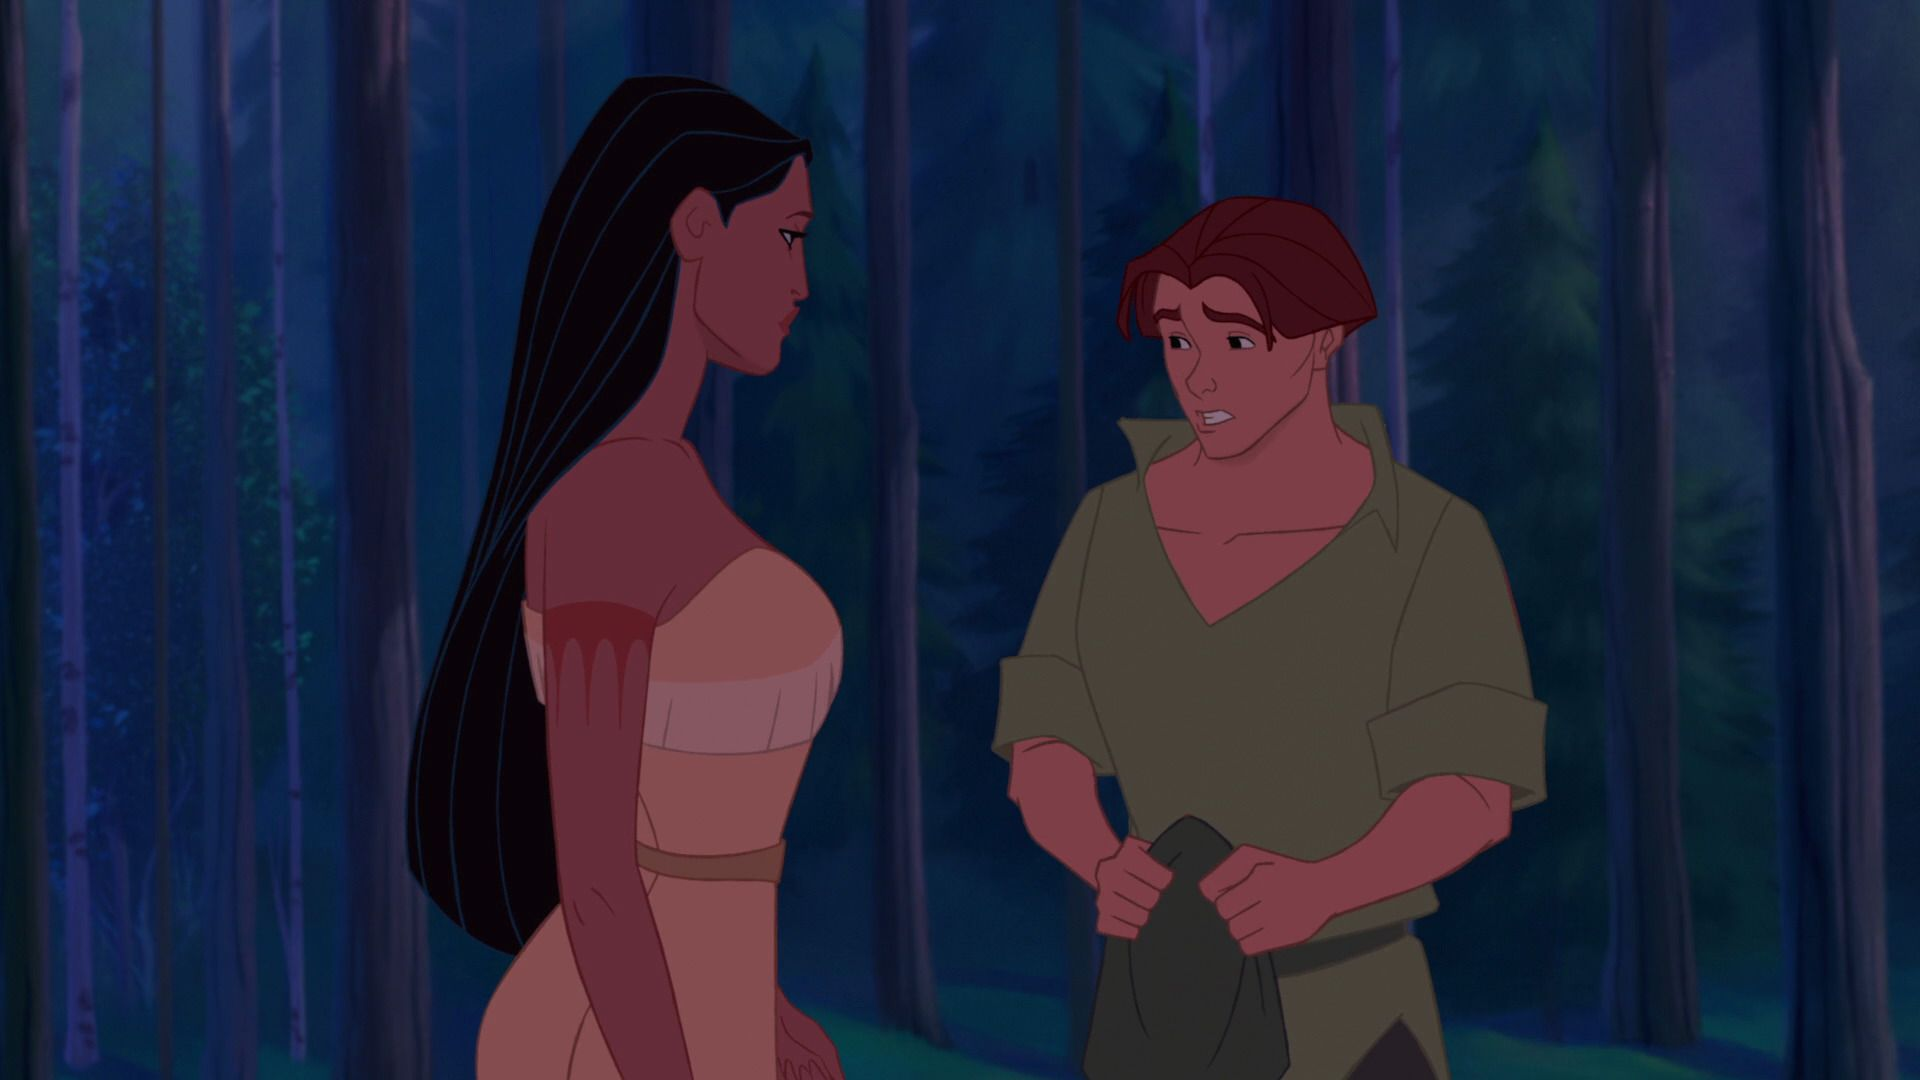 Pocahontas 1995 Animation Screencaps In 2020 Disney Pocahontas Disney Princess Pocahontas Disney Animated Films